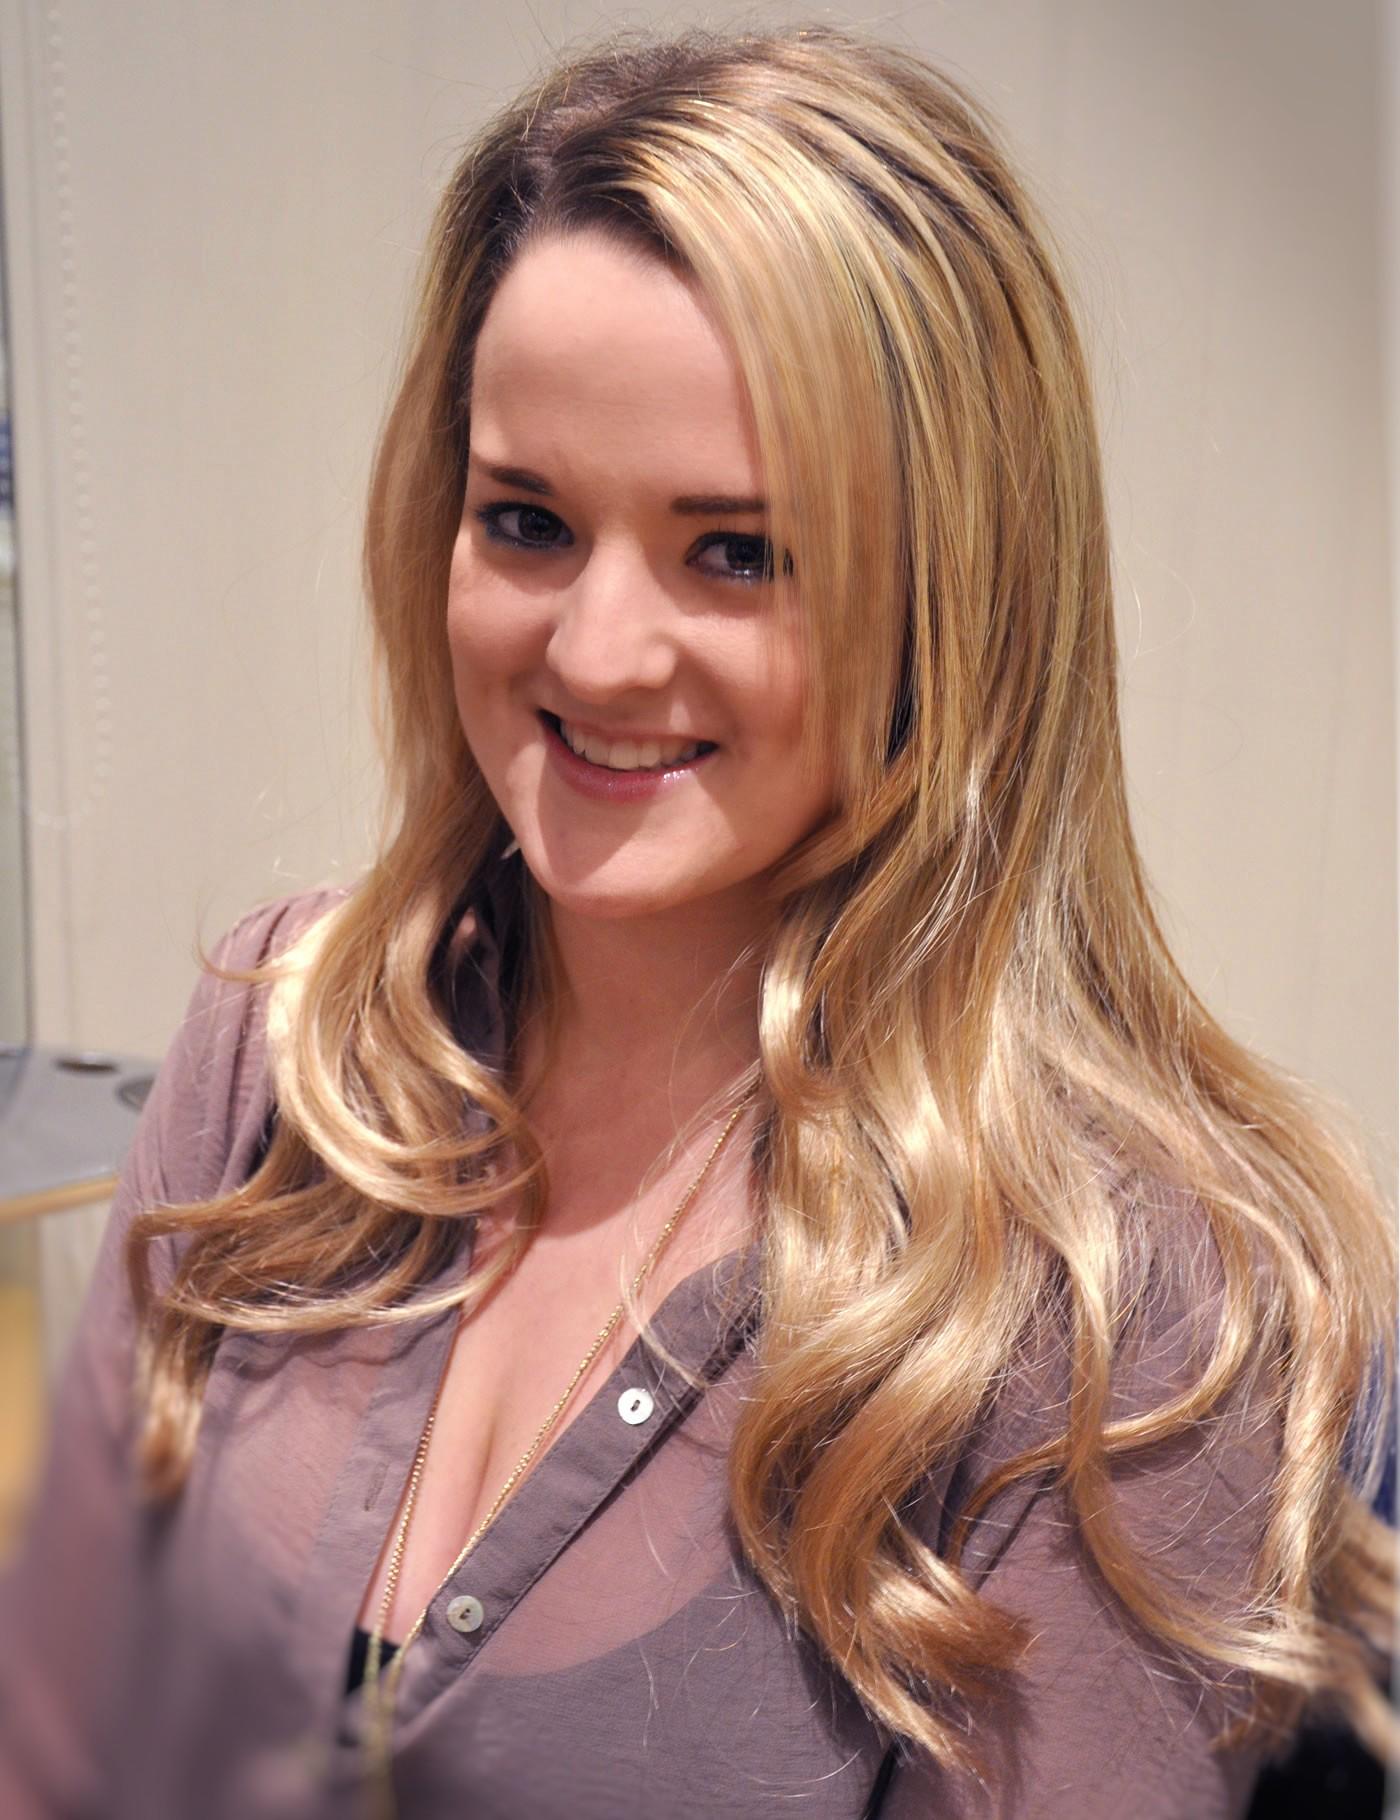 'Glee' Tour cast get hair extensions at Mark Glenn, London - Kimberley after